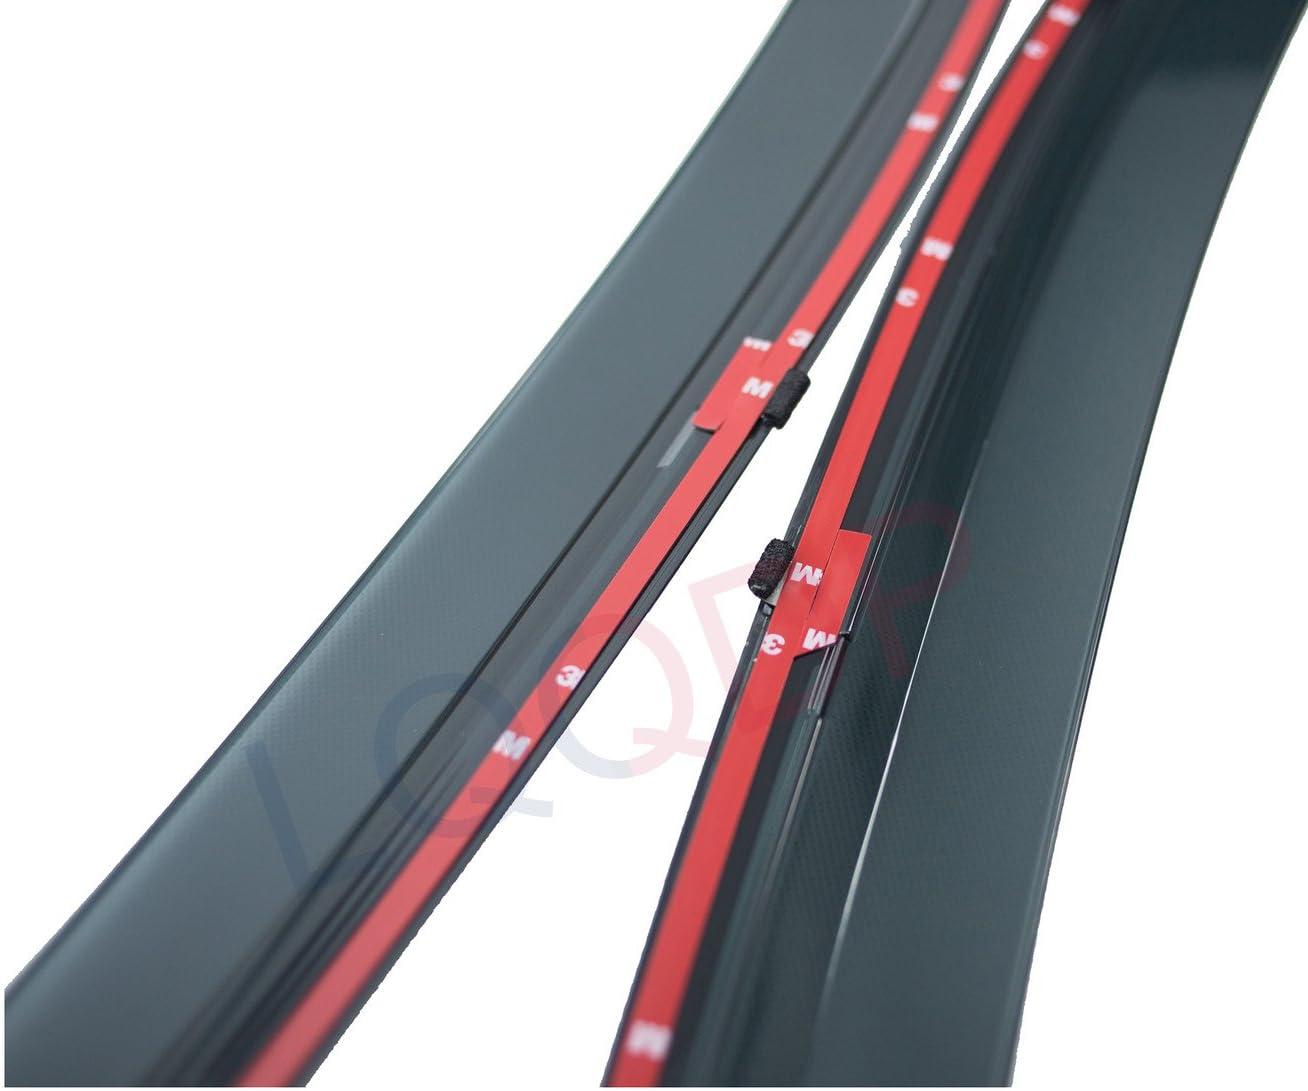 LQQDP 4pcs Smoke Tint With Chrome Trim Outside Mount Tape On//Clip On Style PVC Sun Rain Guard Vent Window Visors Fit 15-20 Nissan Murano